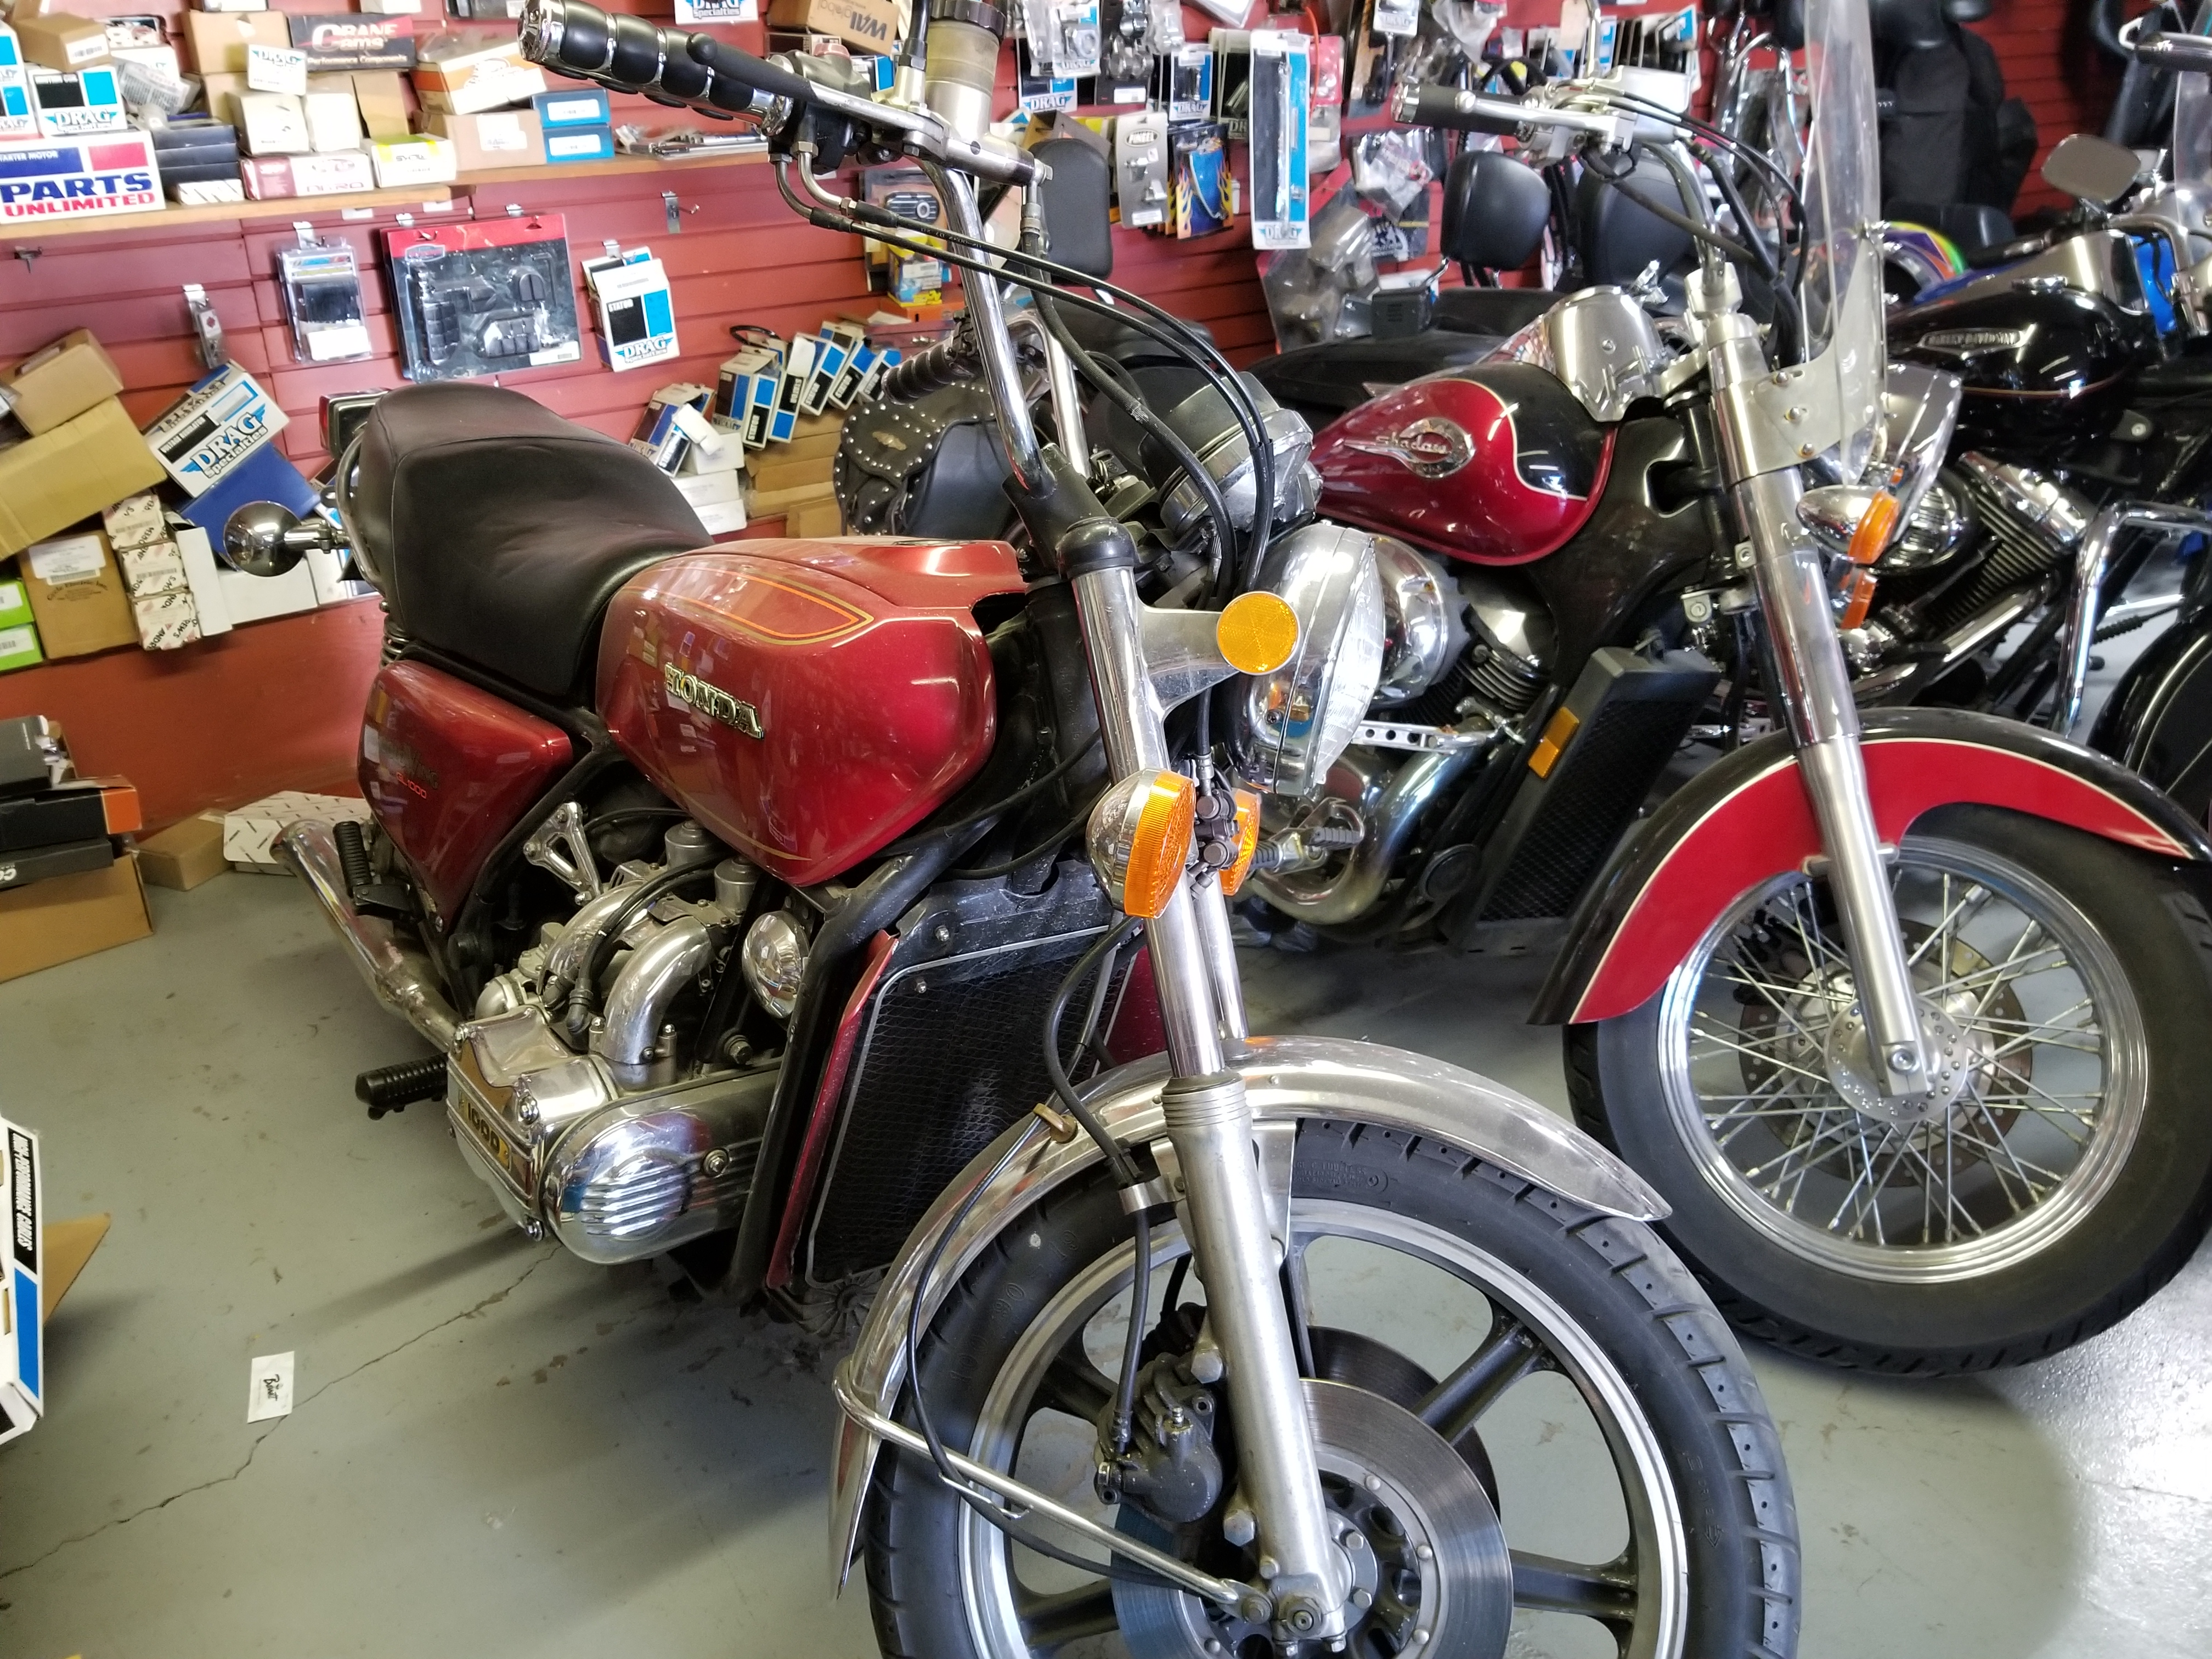 1975 Honda Goldwing 30,000 miles, mint condition $2,000